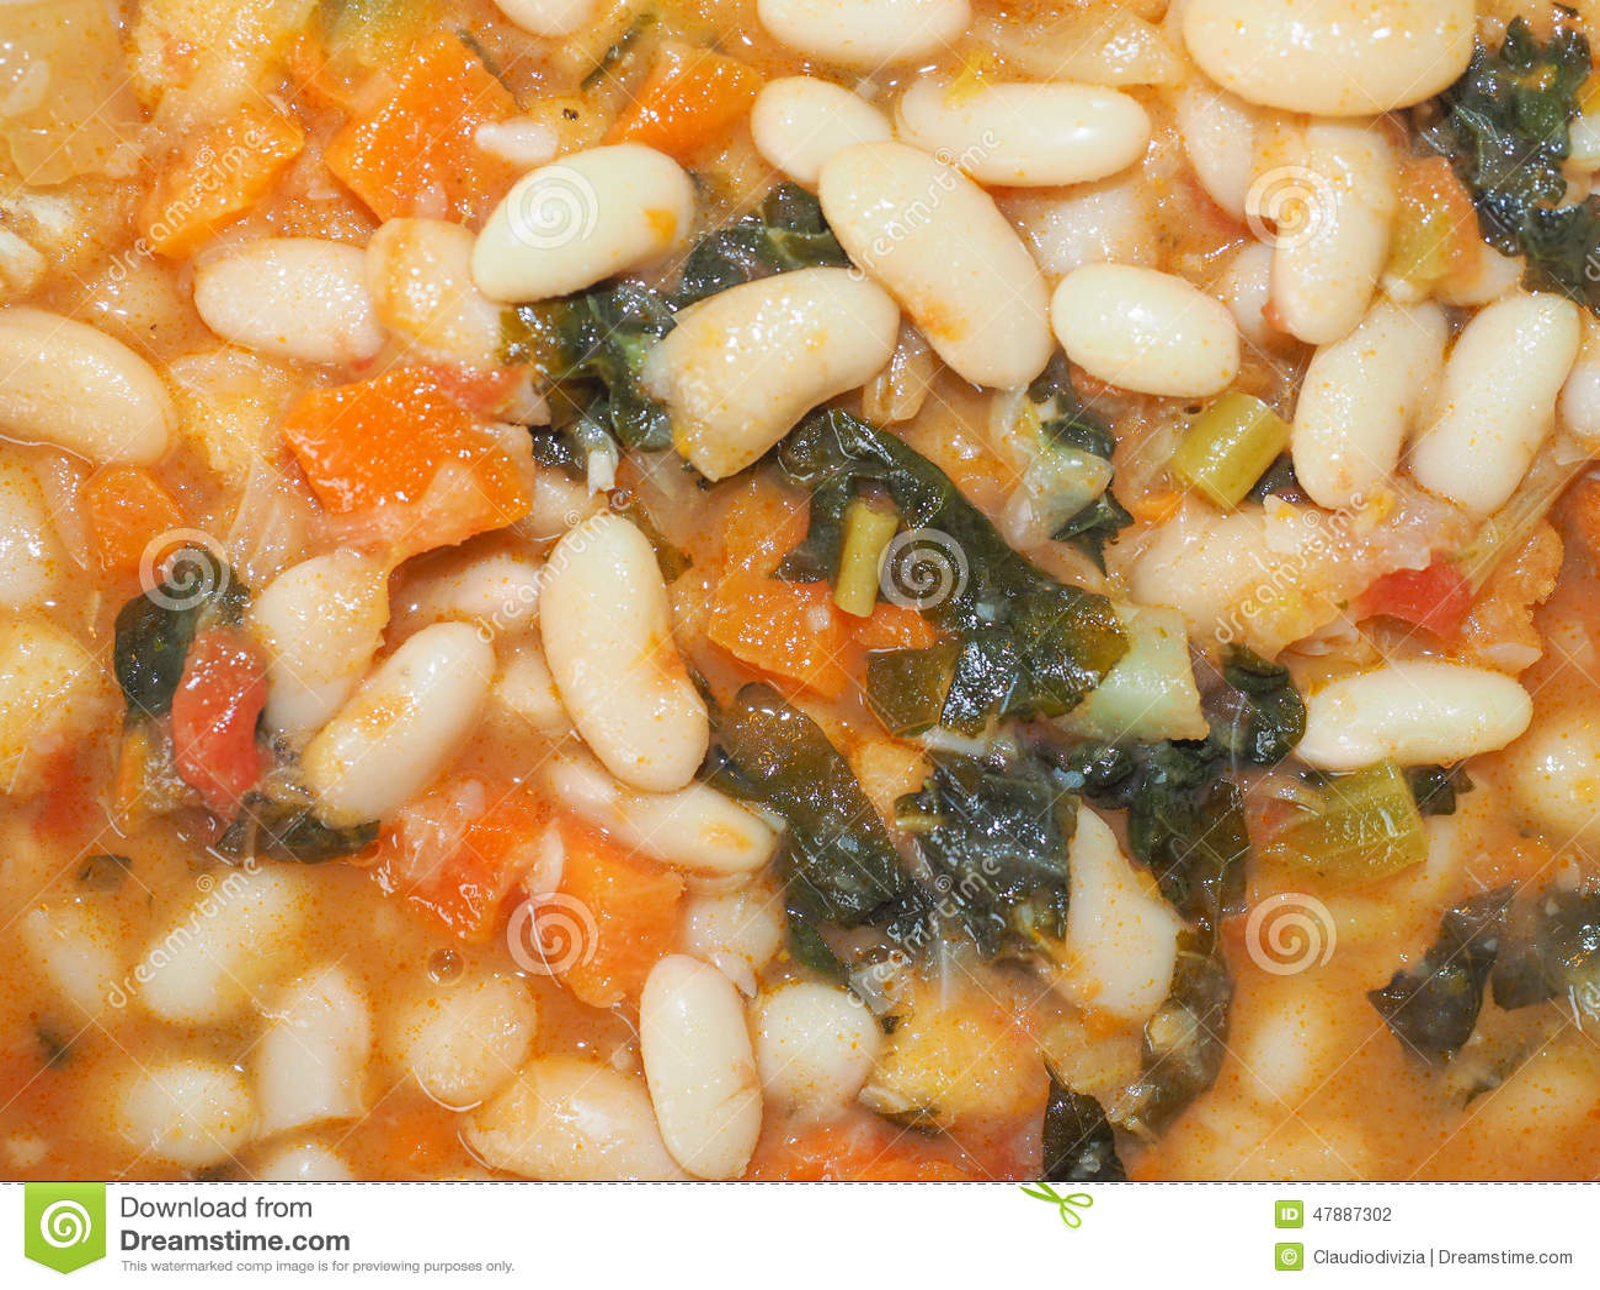 Ribollita Tuscan soup stock photo  Image of kale, beans